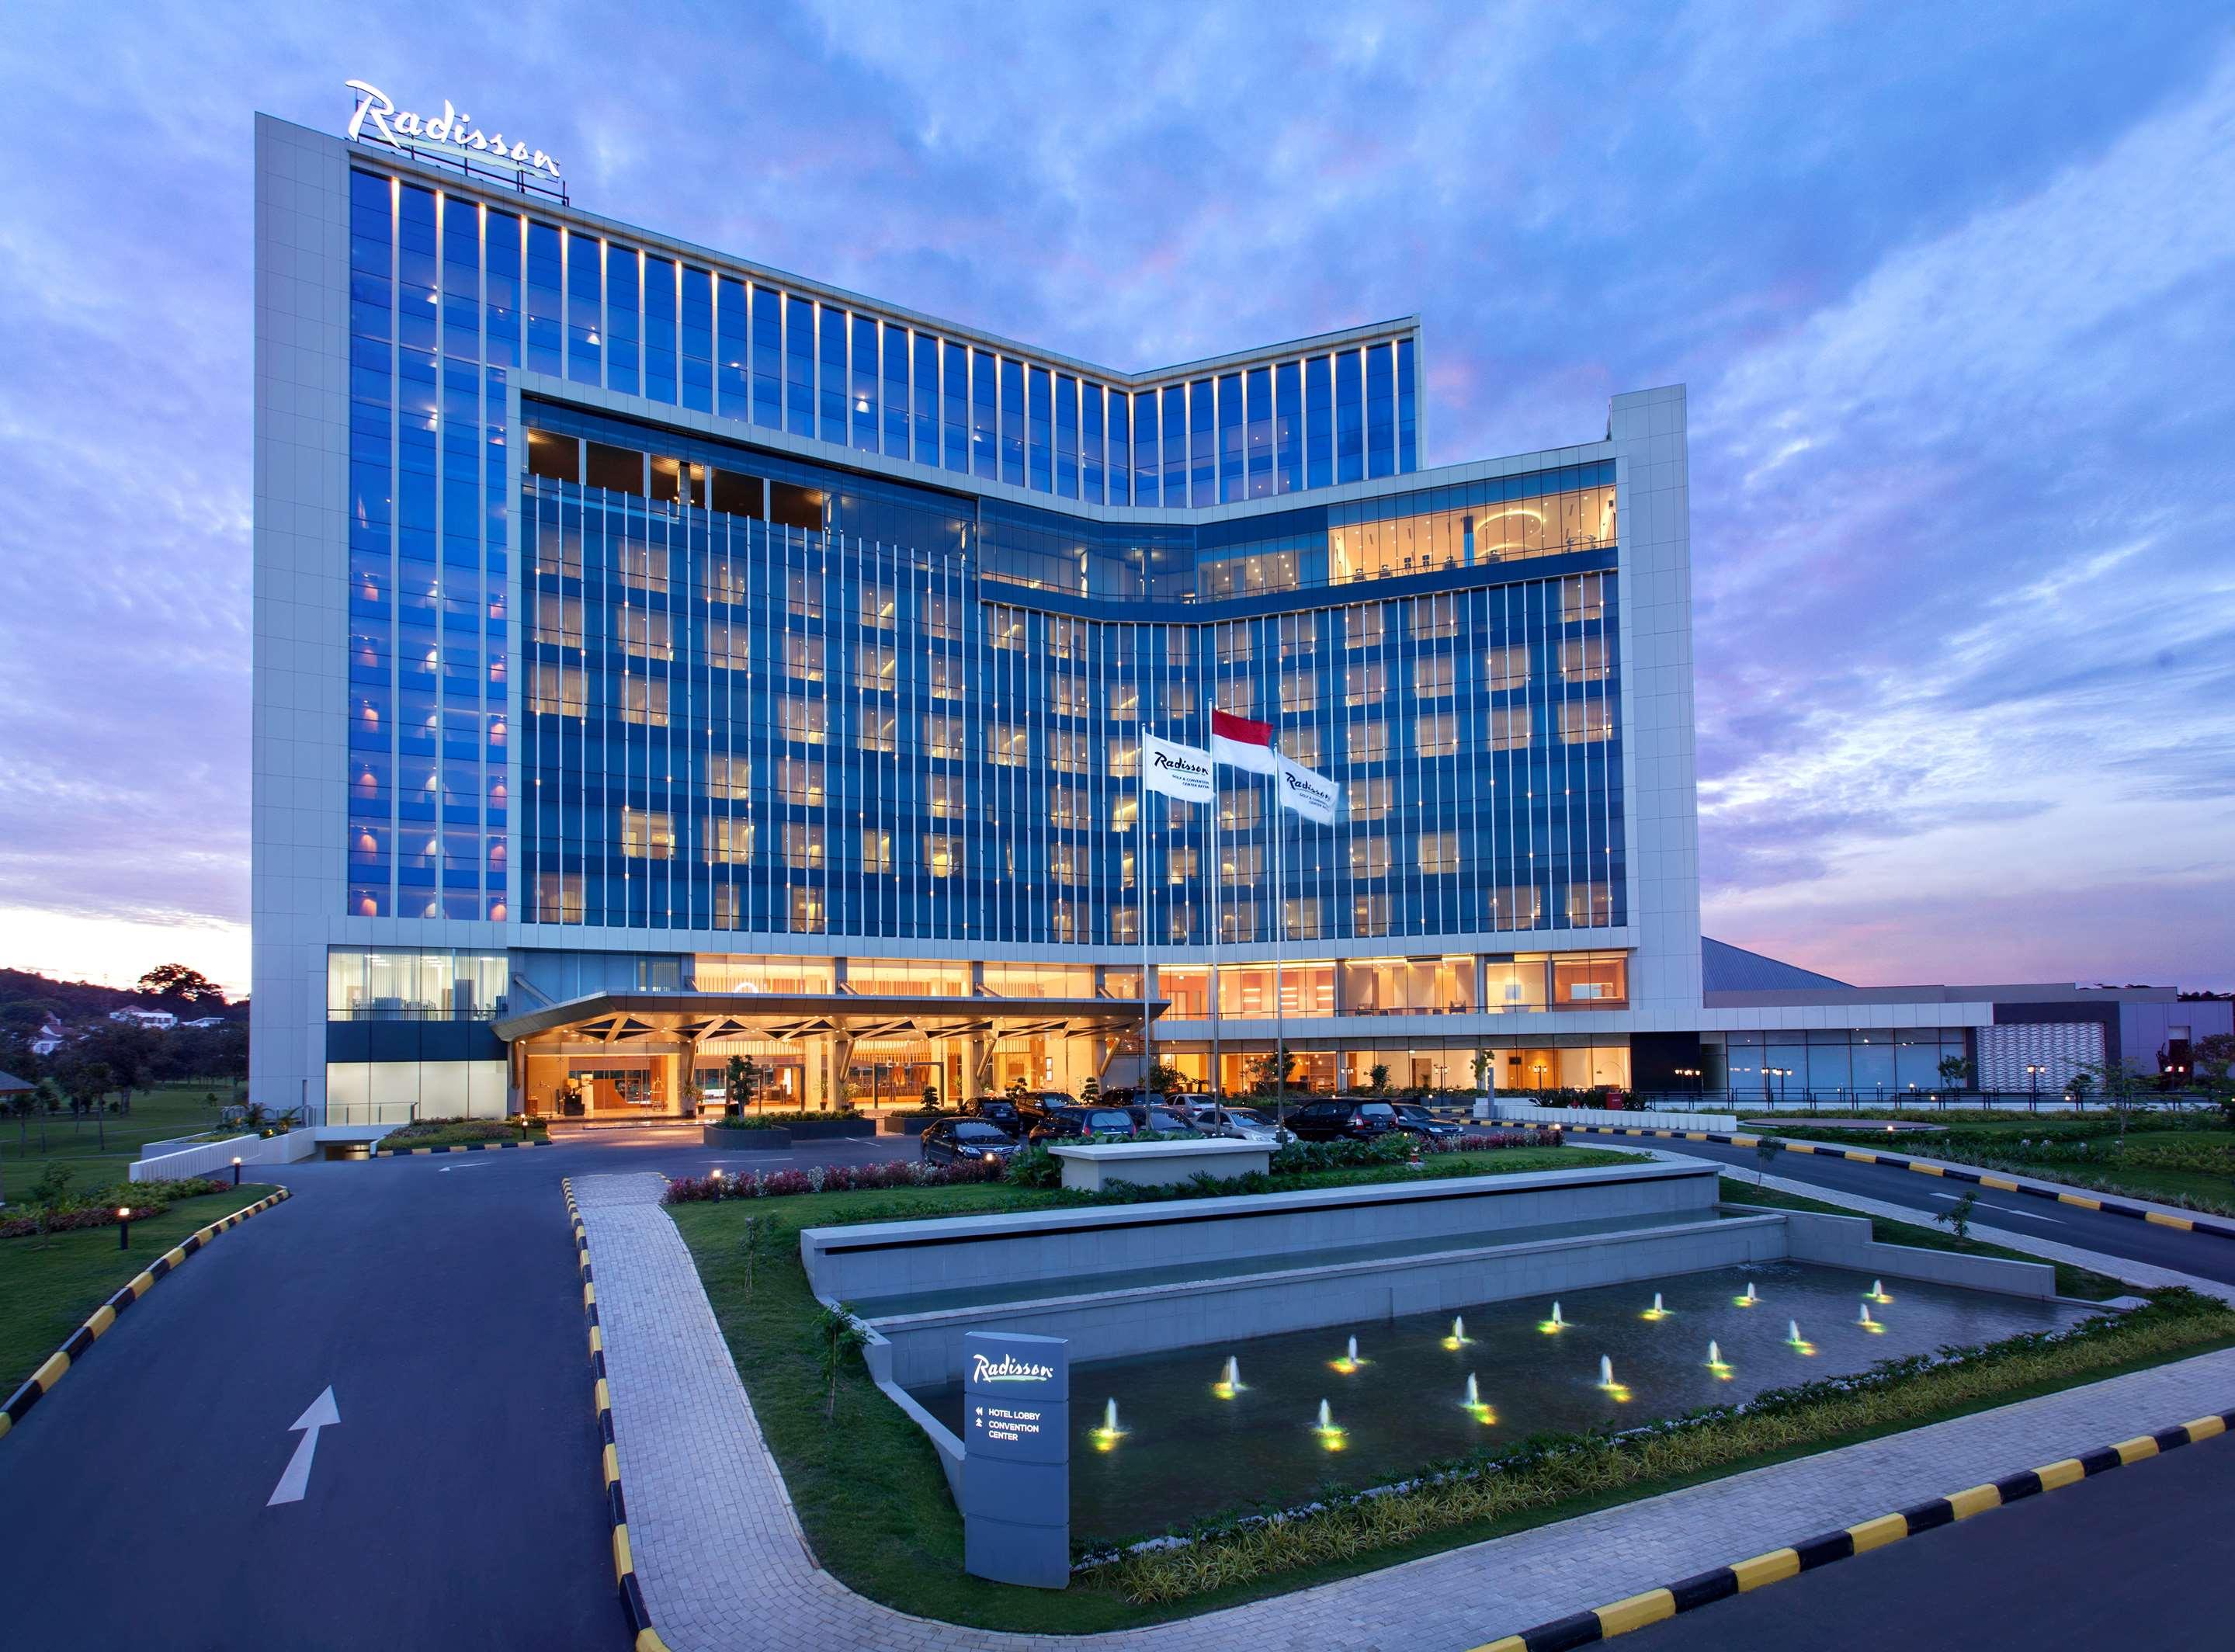 Batam Hotels | Radisson Golf & Convention Center Batam